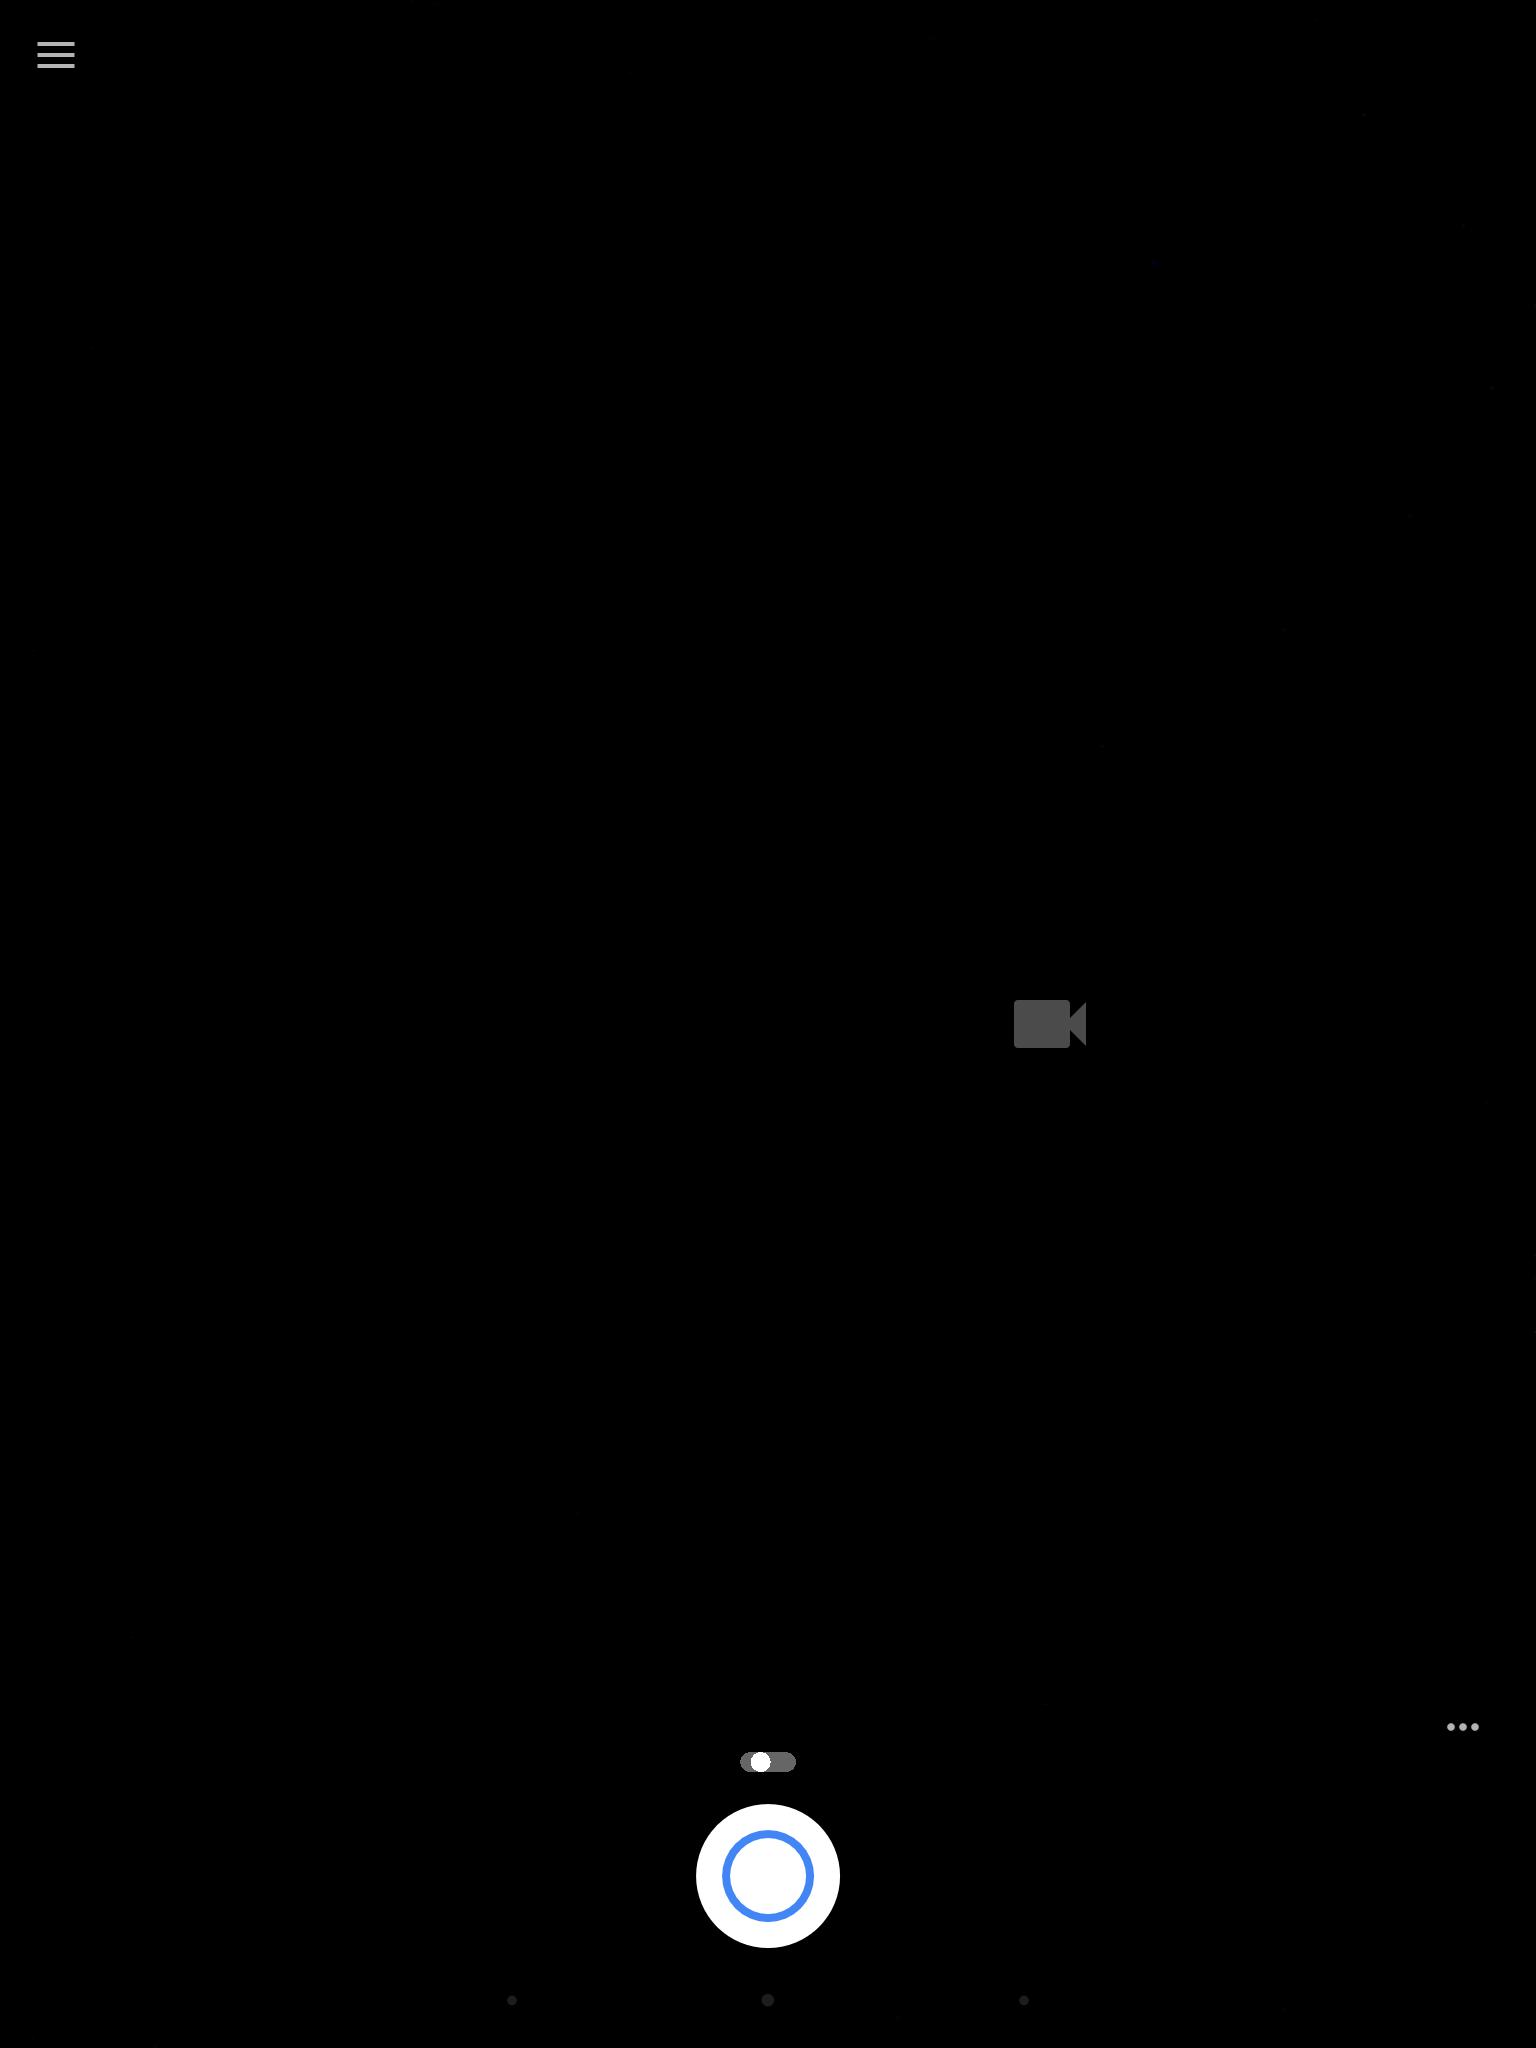 Google Camera v3 0 Sneak Peek - Part 2: Camera2, Slow Motion